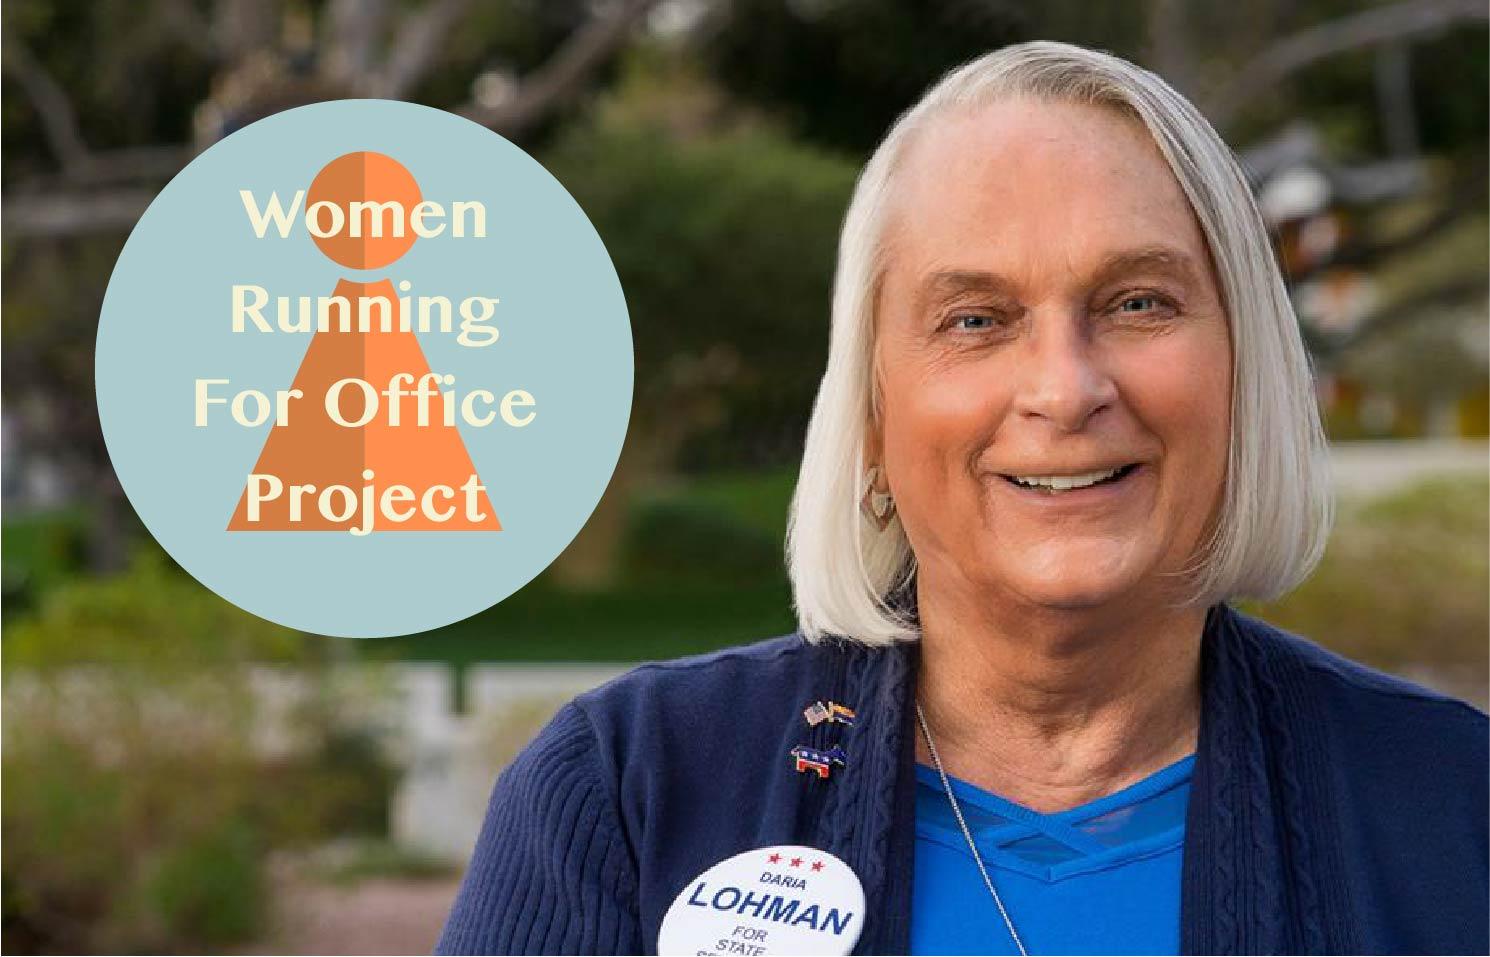 Daria Lohman is running for Arizona Senate District 23